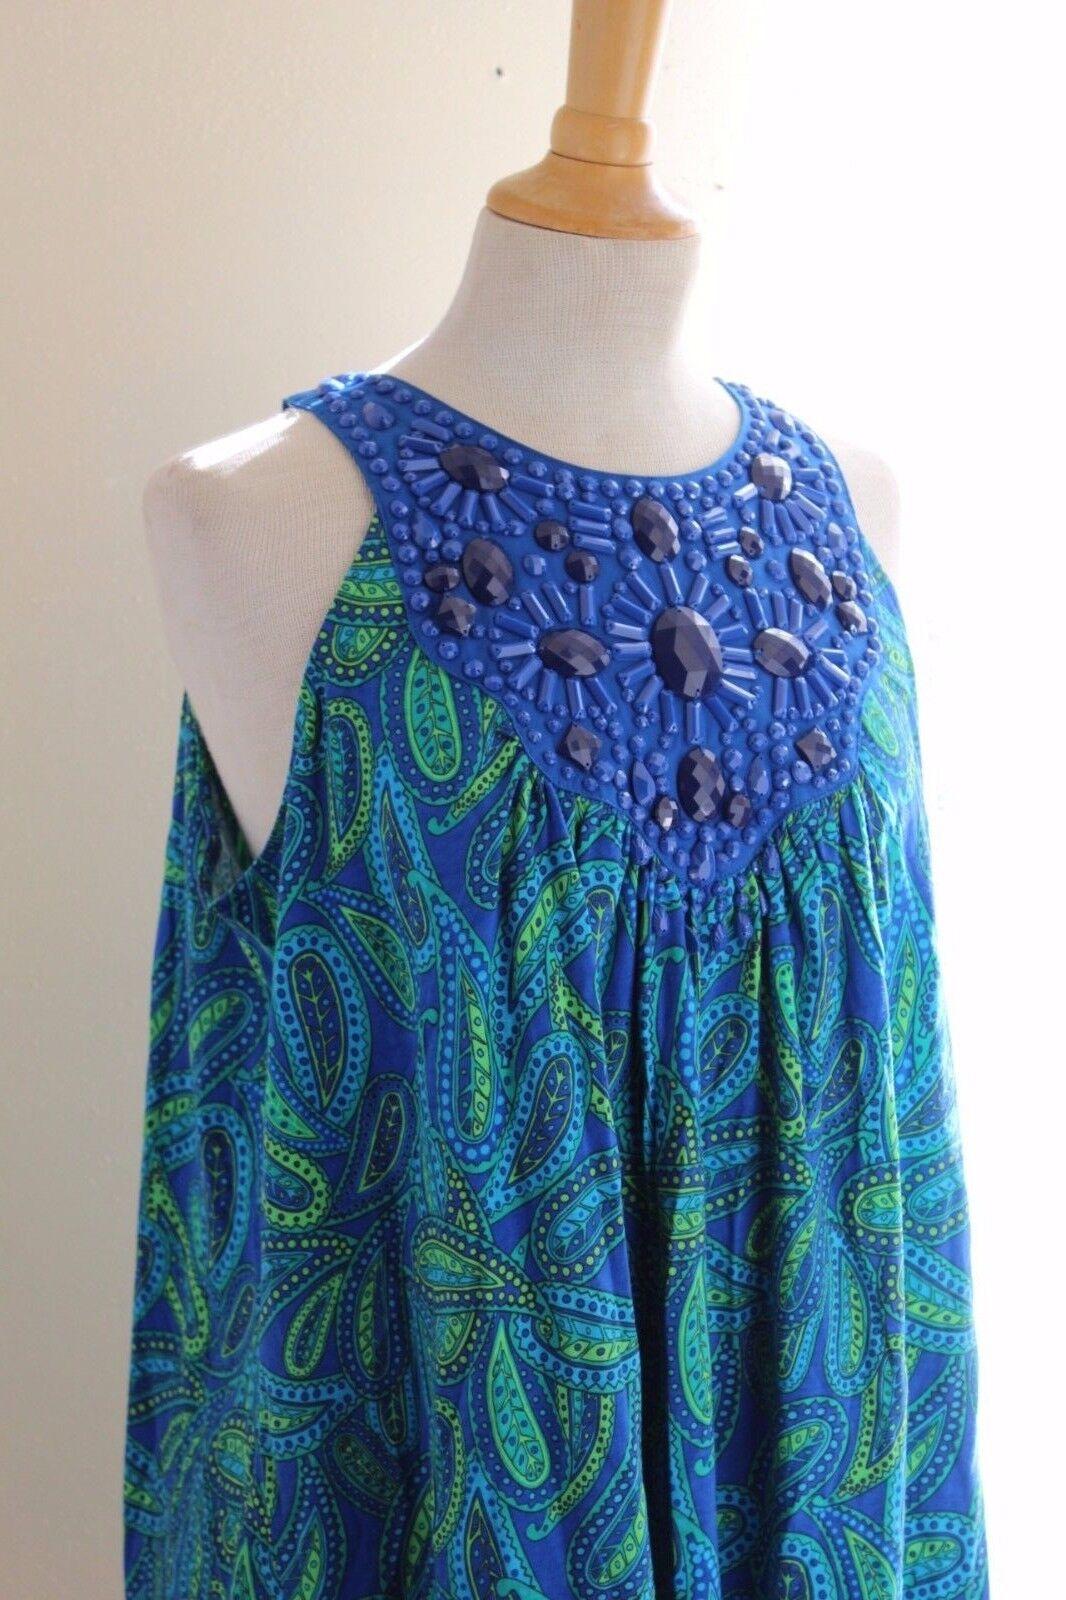 NWT Diane Gilman Rich Paisley Beaded Blau Grün Sleeveless Funky Shirt Top Sz 1X